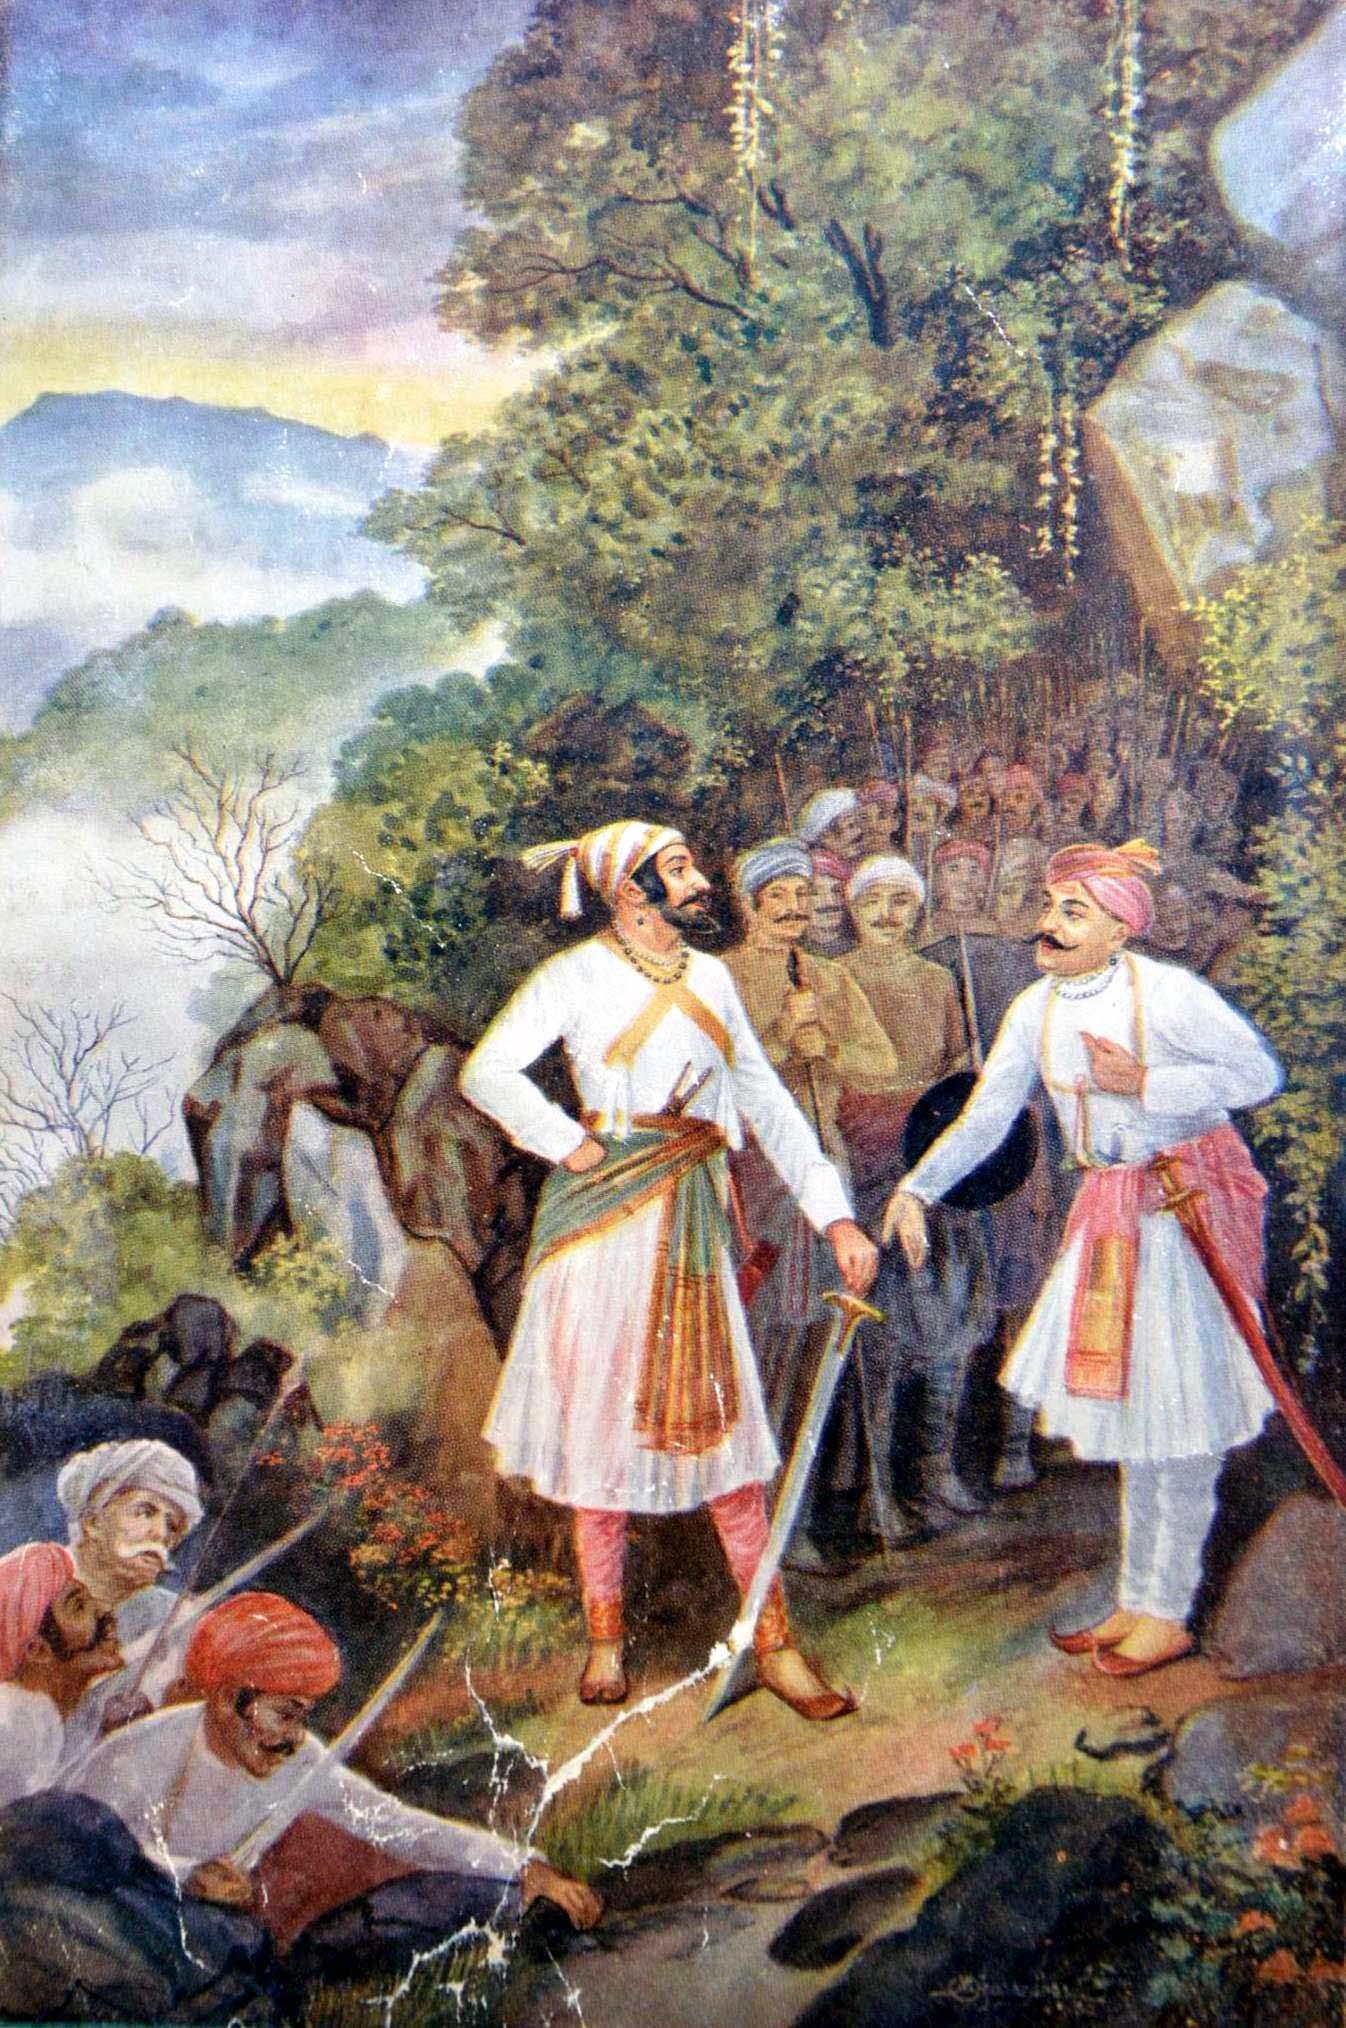 Shivaji and Baji Prabhu at Pawan Khind